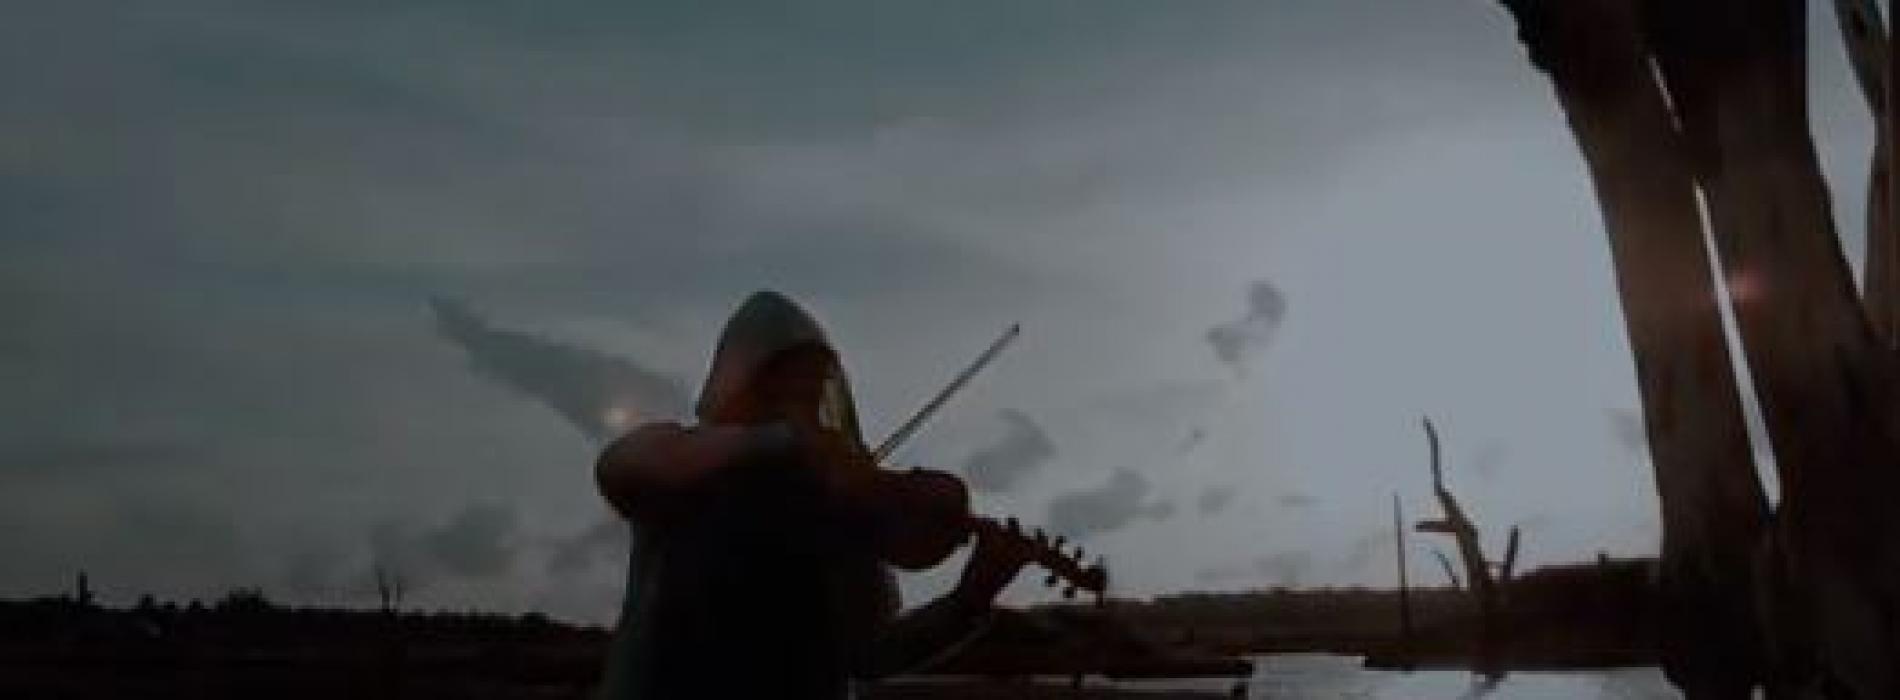 New Music : Game Of Thrones   Cinematic Violin Cover   Supun Pankaja